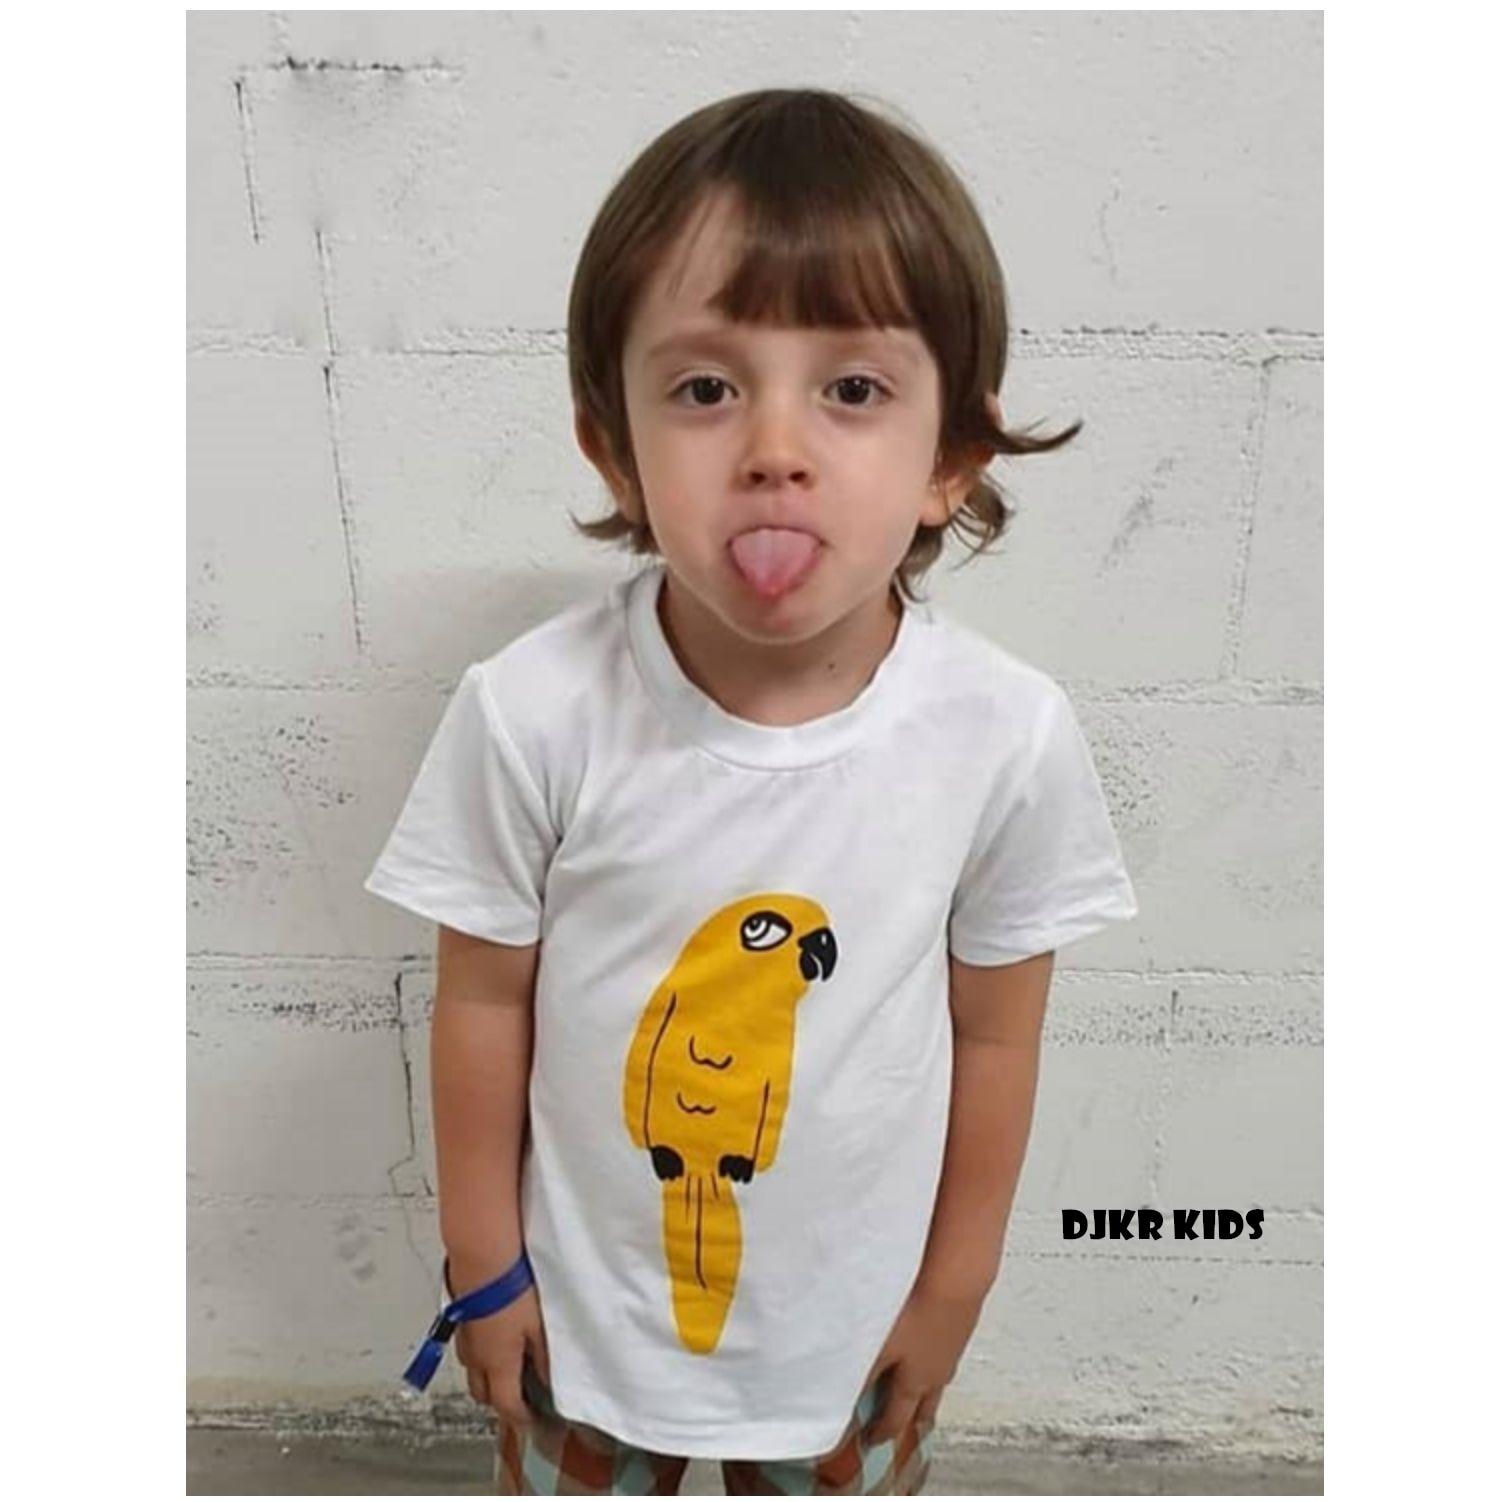 2021 New Summer Mini Kids T-shirts Baby Girls Clothes Cartoon Short Sleeve Toddler Christmas Shirt Striped Shirt Boys Tops Tees 3